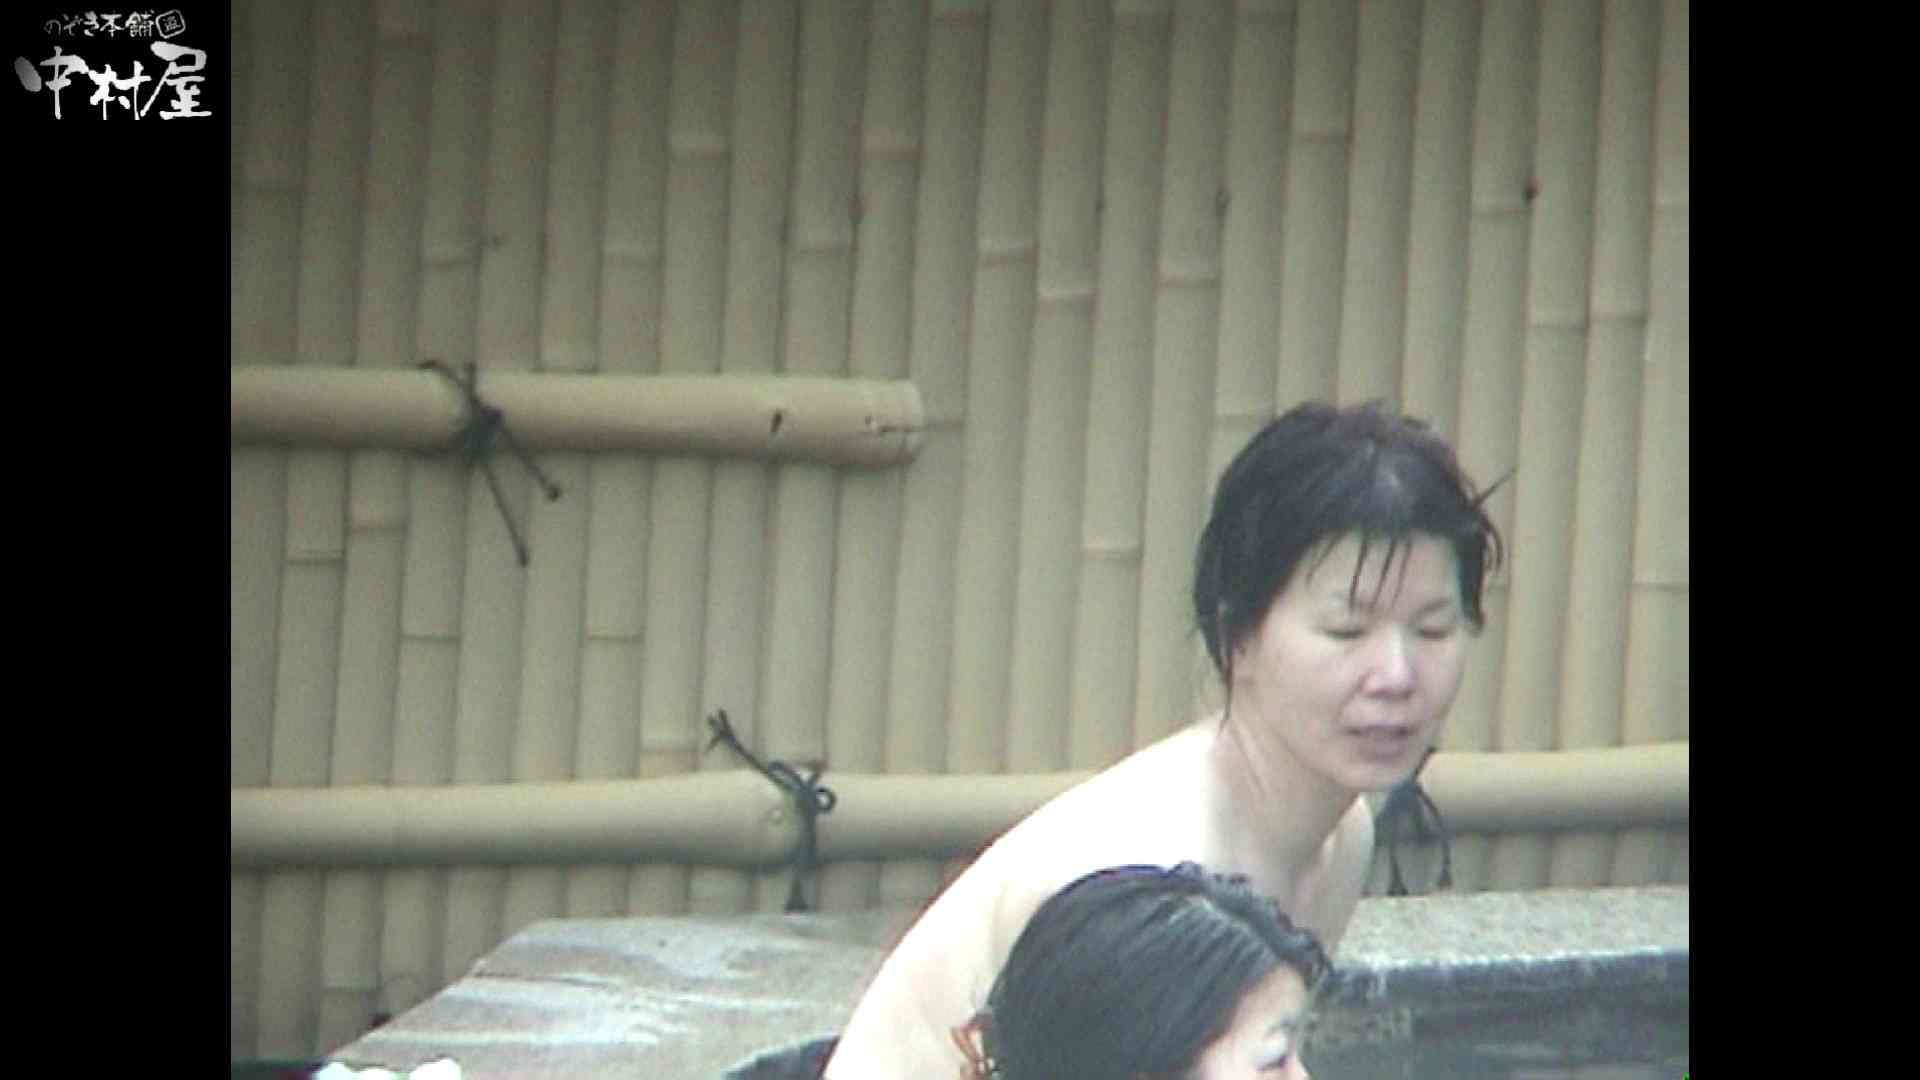 Aquaな露天風呂Vol.936 OLセックス 覗きぱこり動画紹介 75画像 29